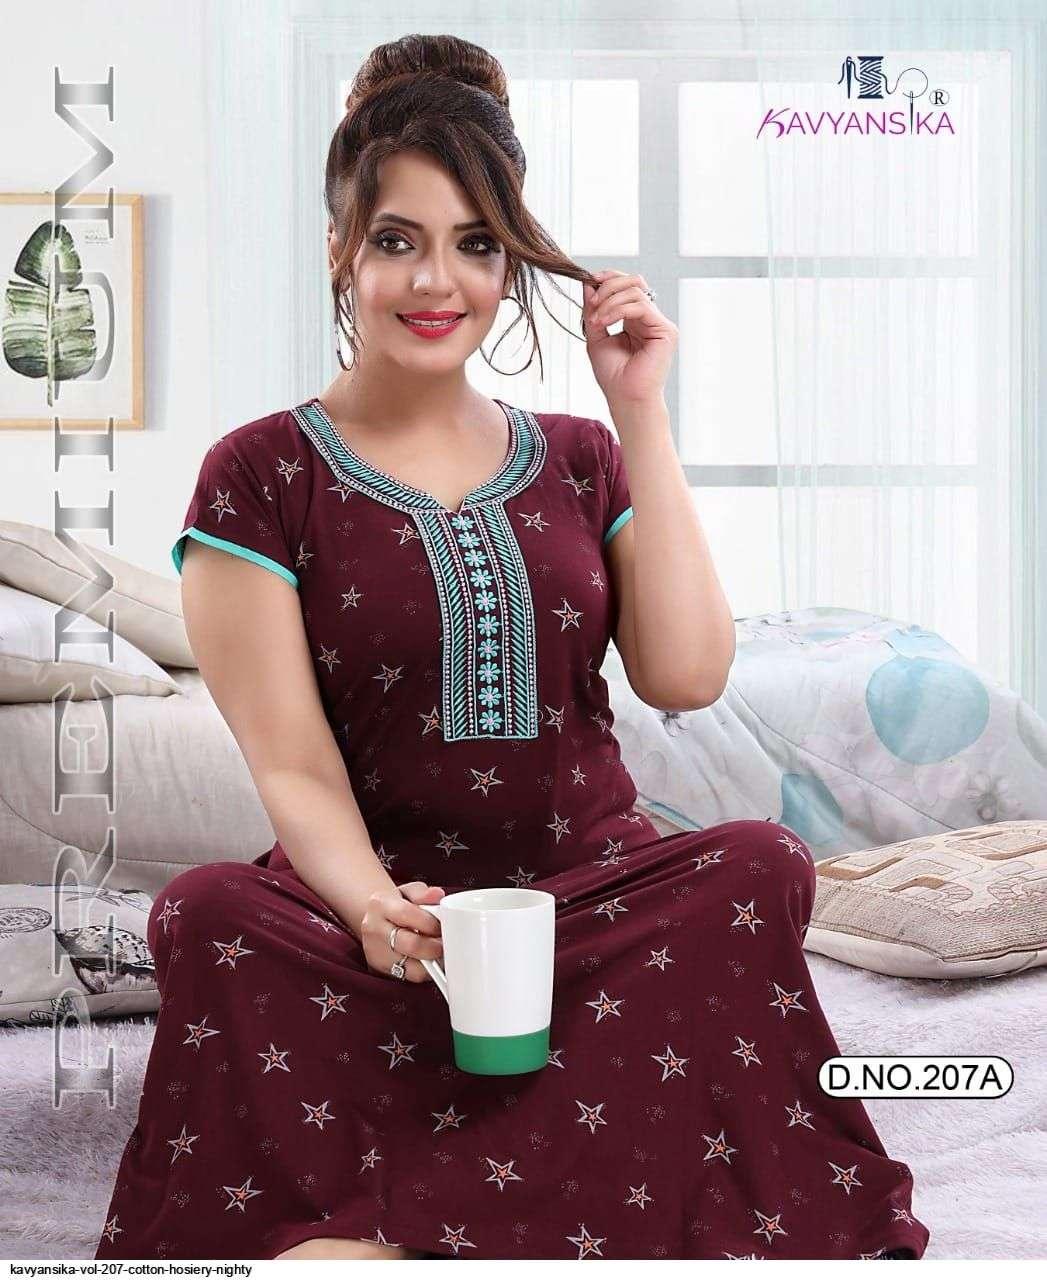 kavyansika nighty 207 cotton hosiery printed work women night gown